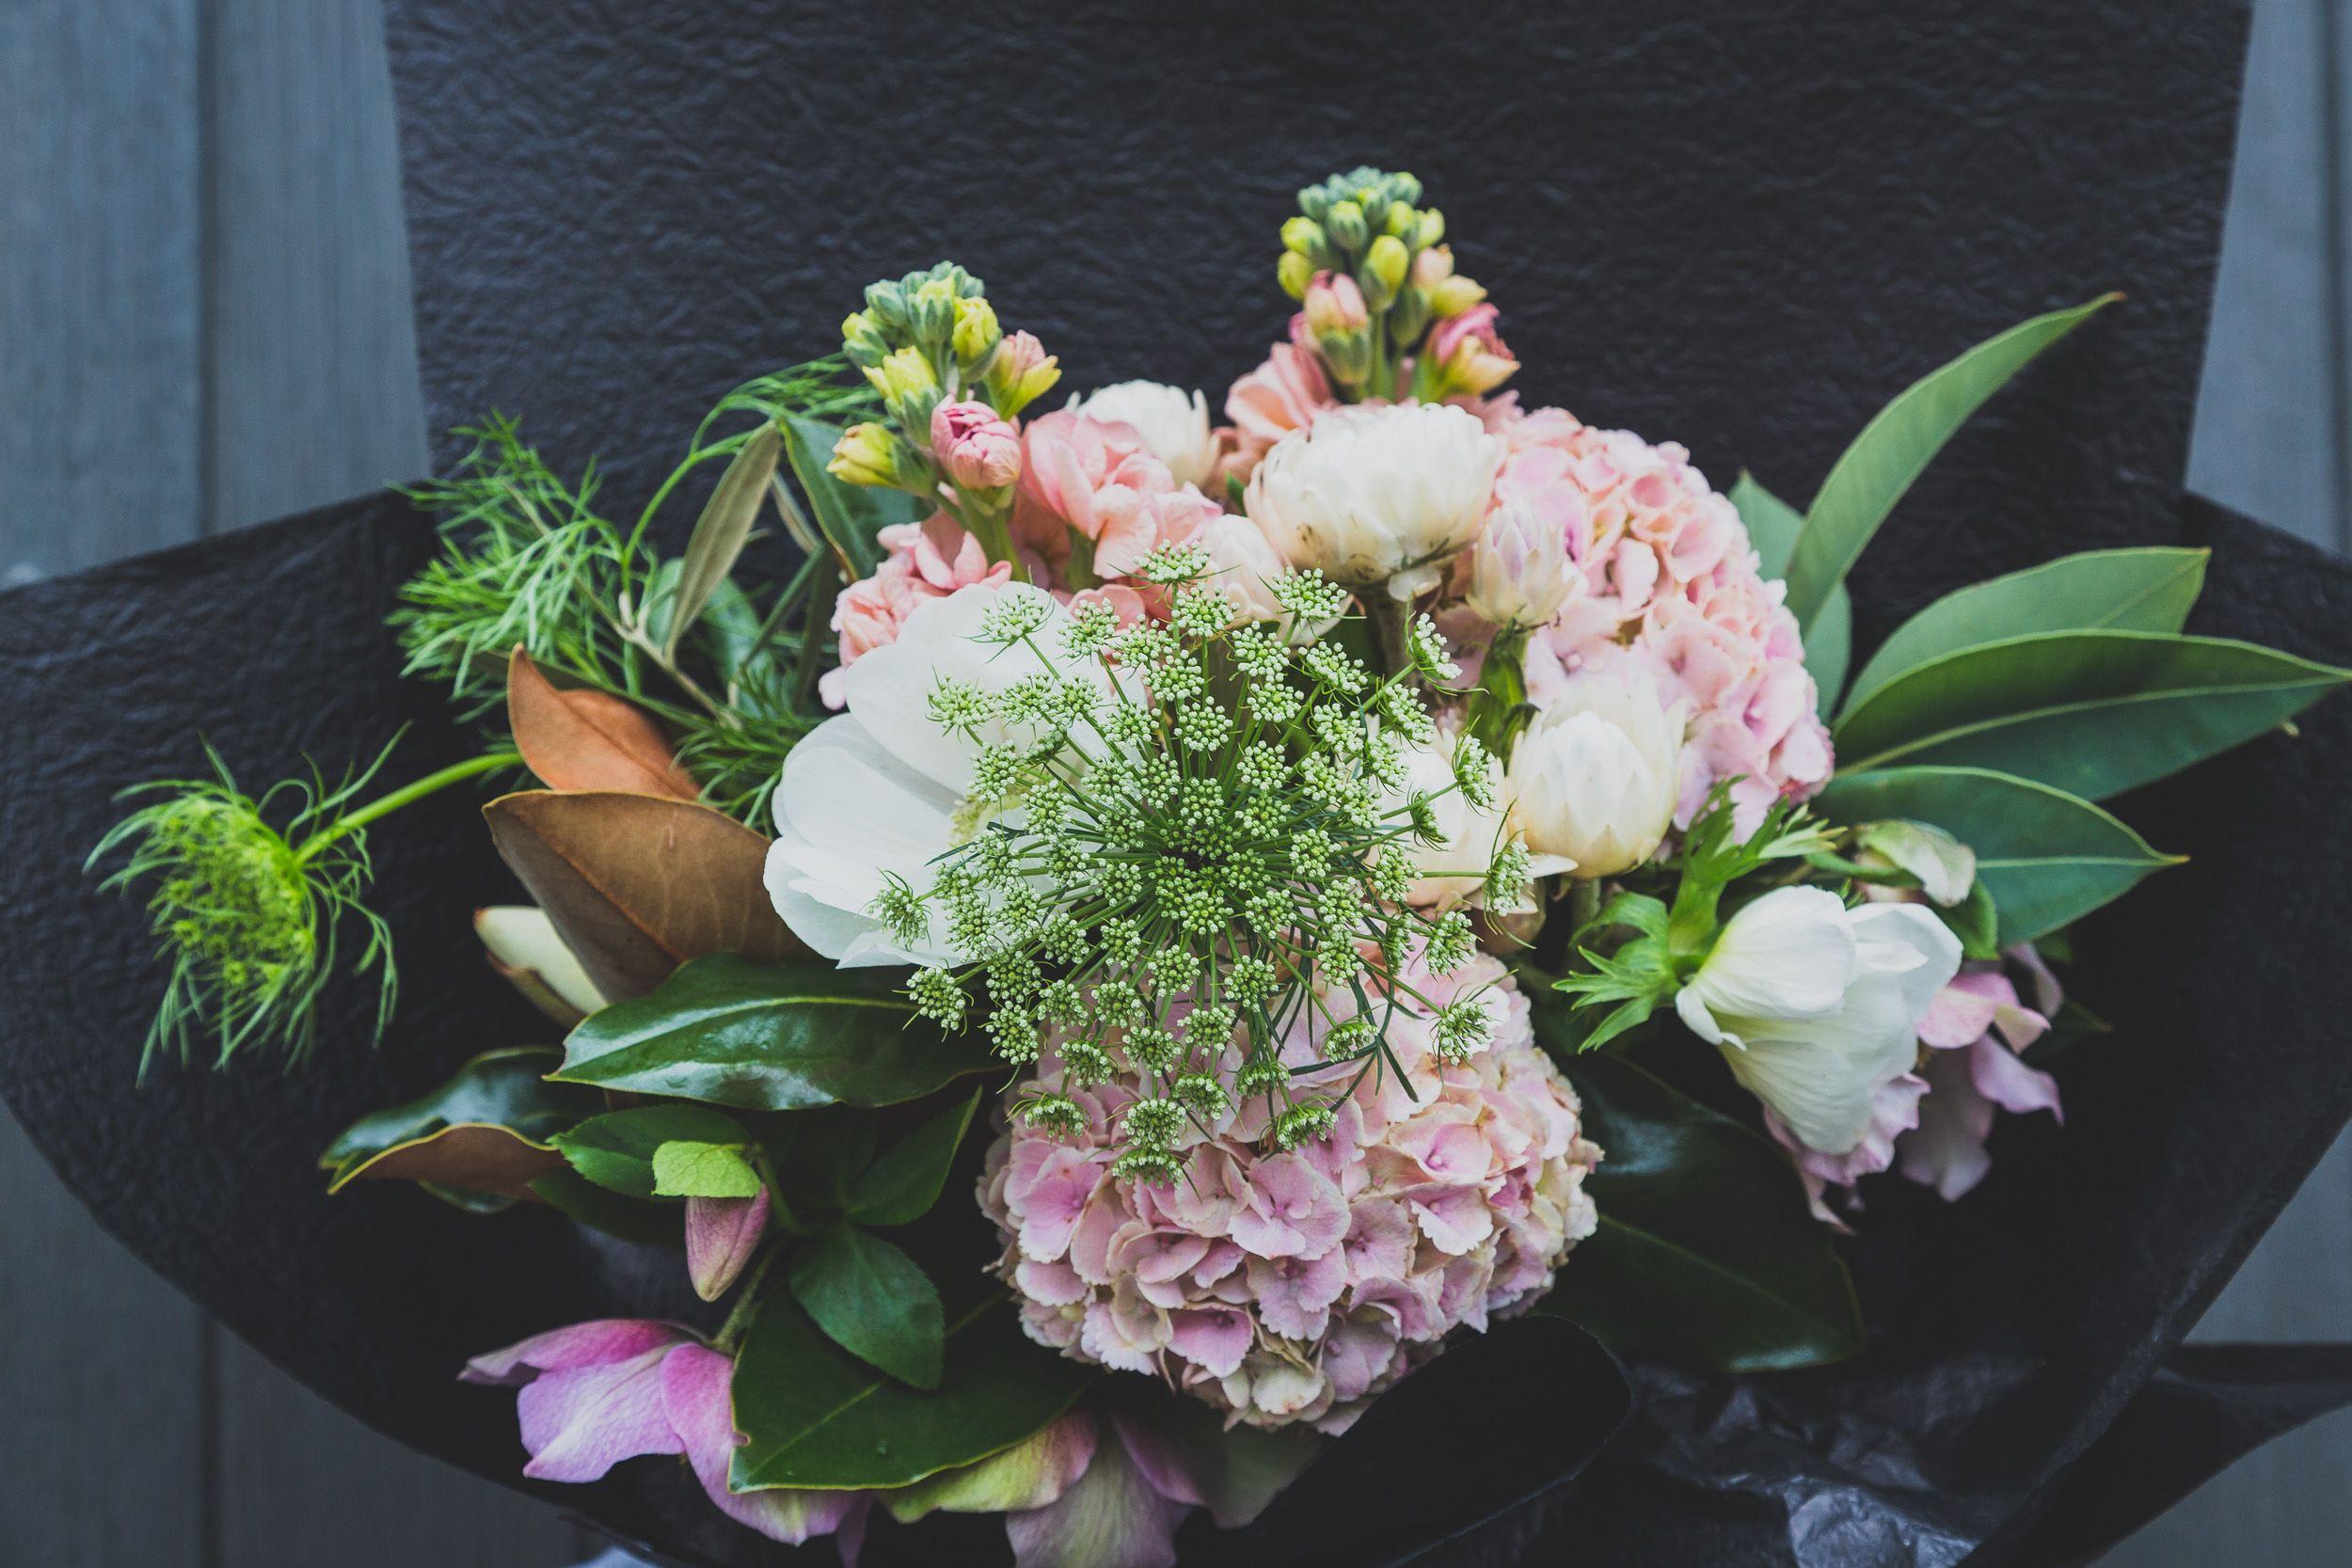 Order Online Same Day Delivery Melbourne Flower Delivery Flowers